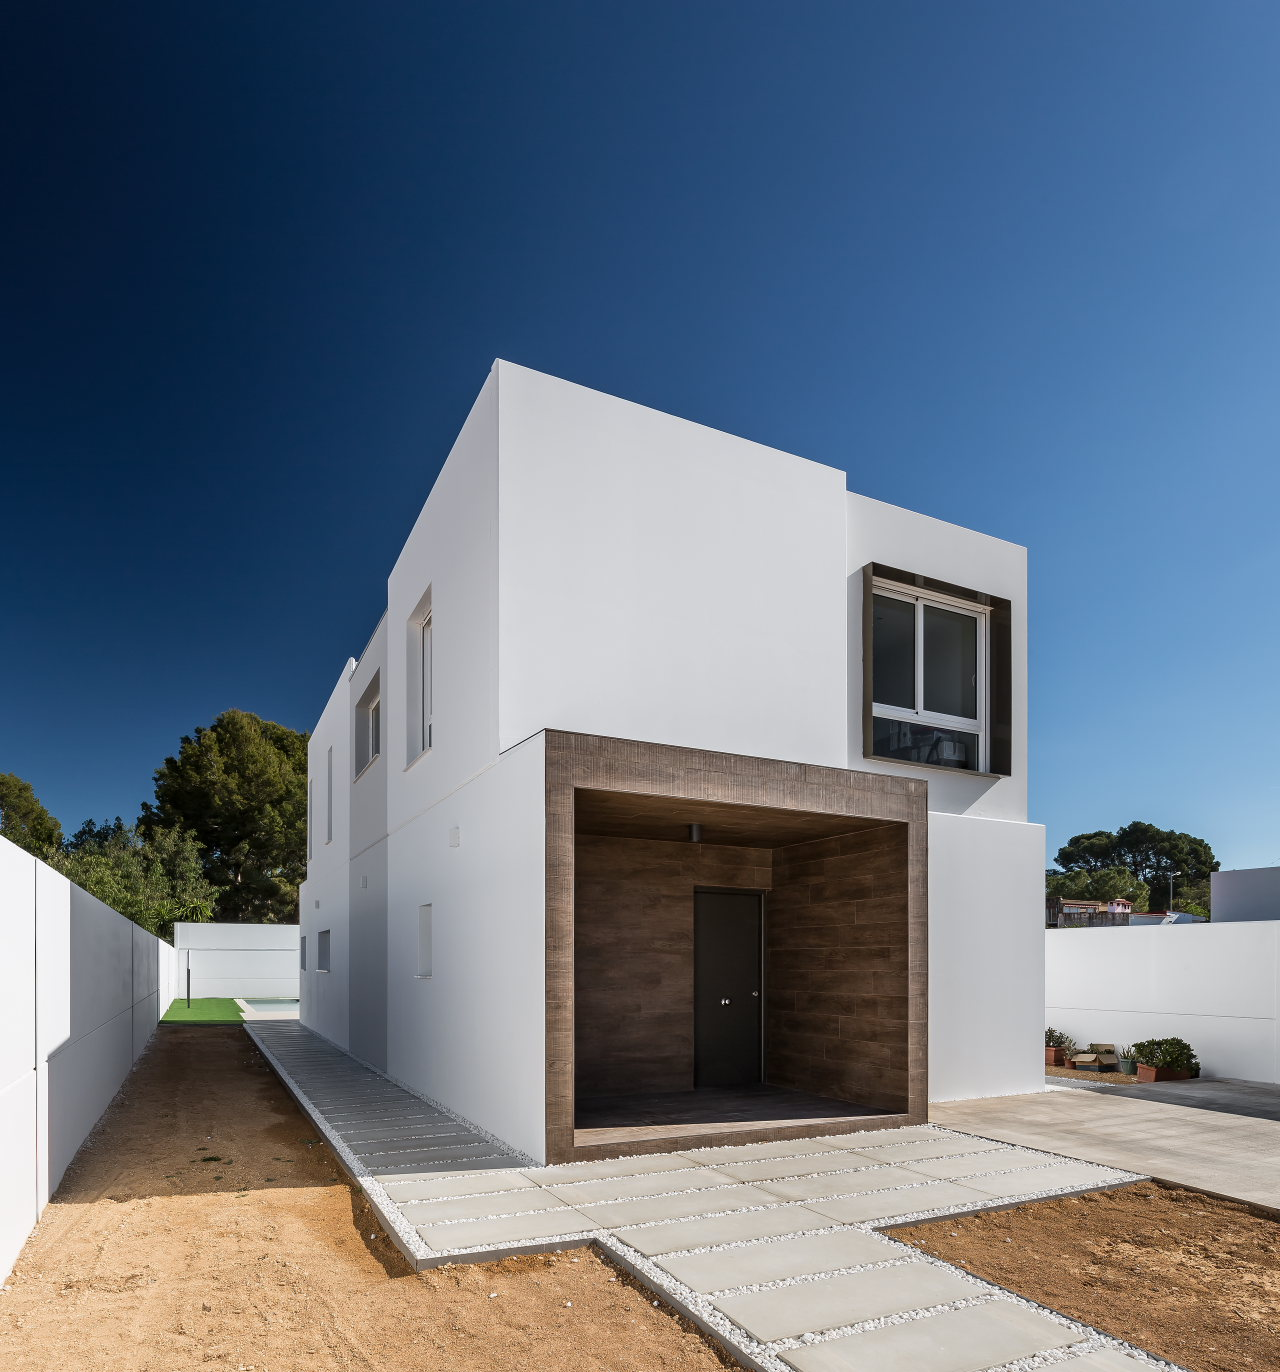 fotografia-arquitectura-valencia-german-cabo-viraje-san-antonio (11)